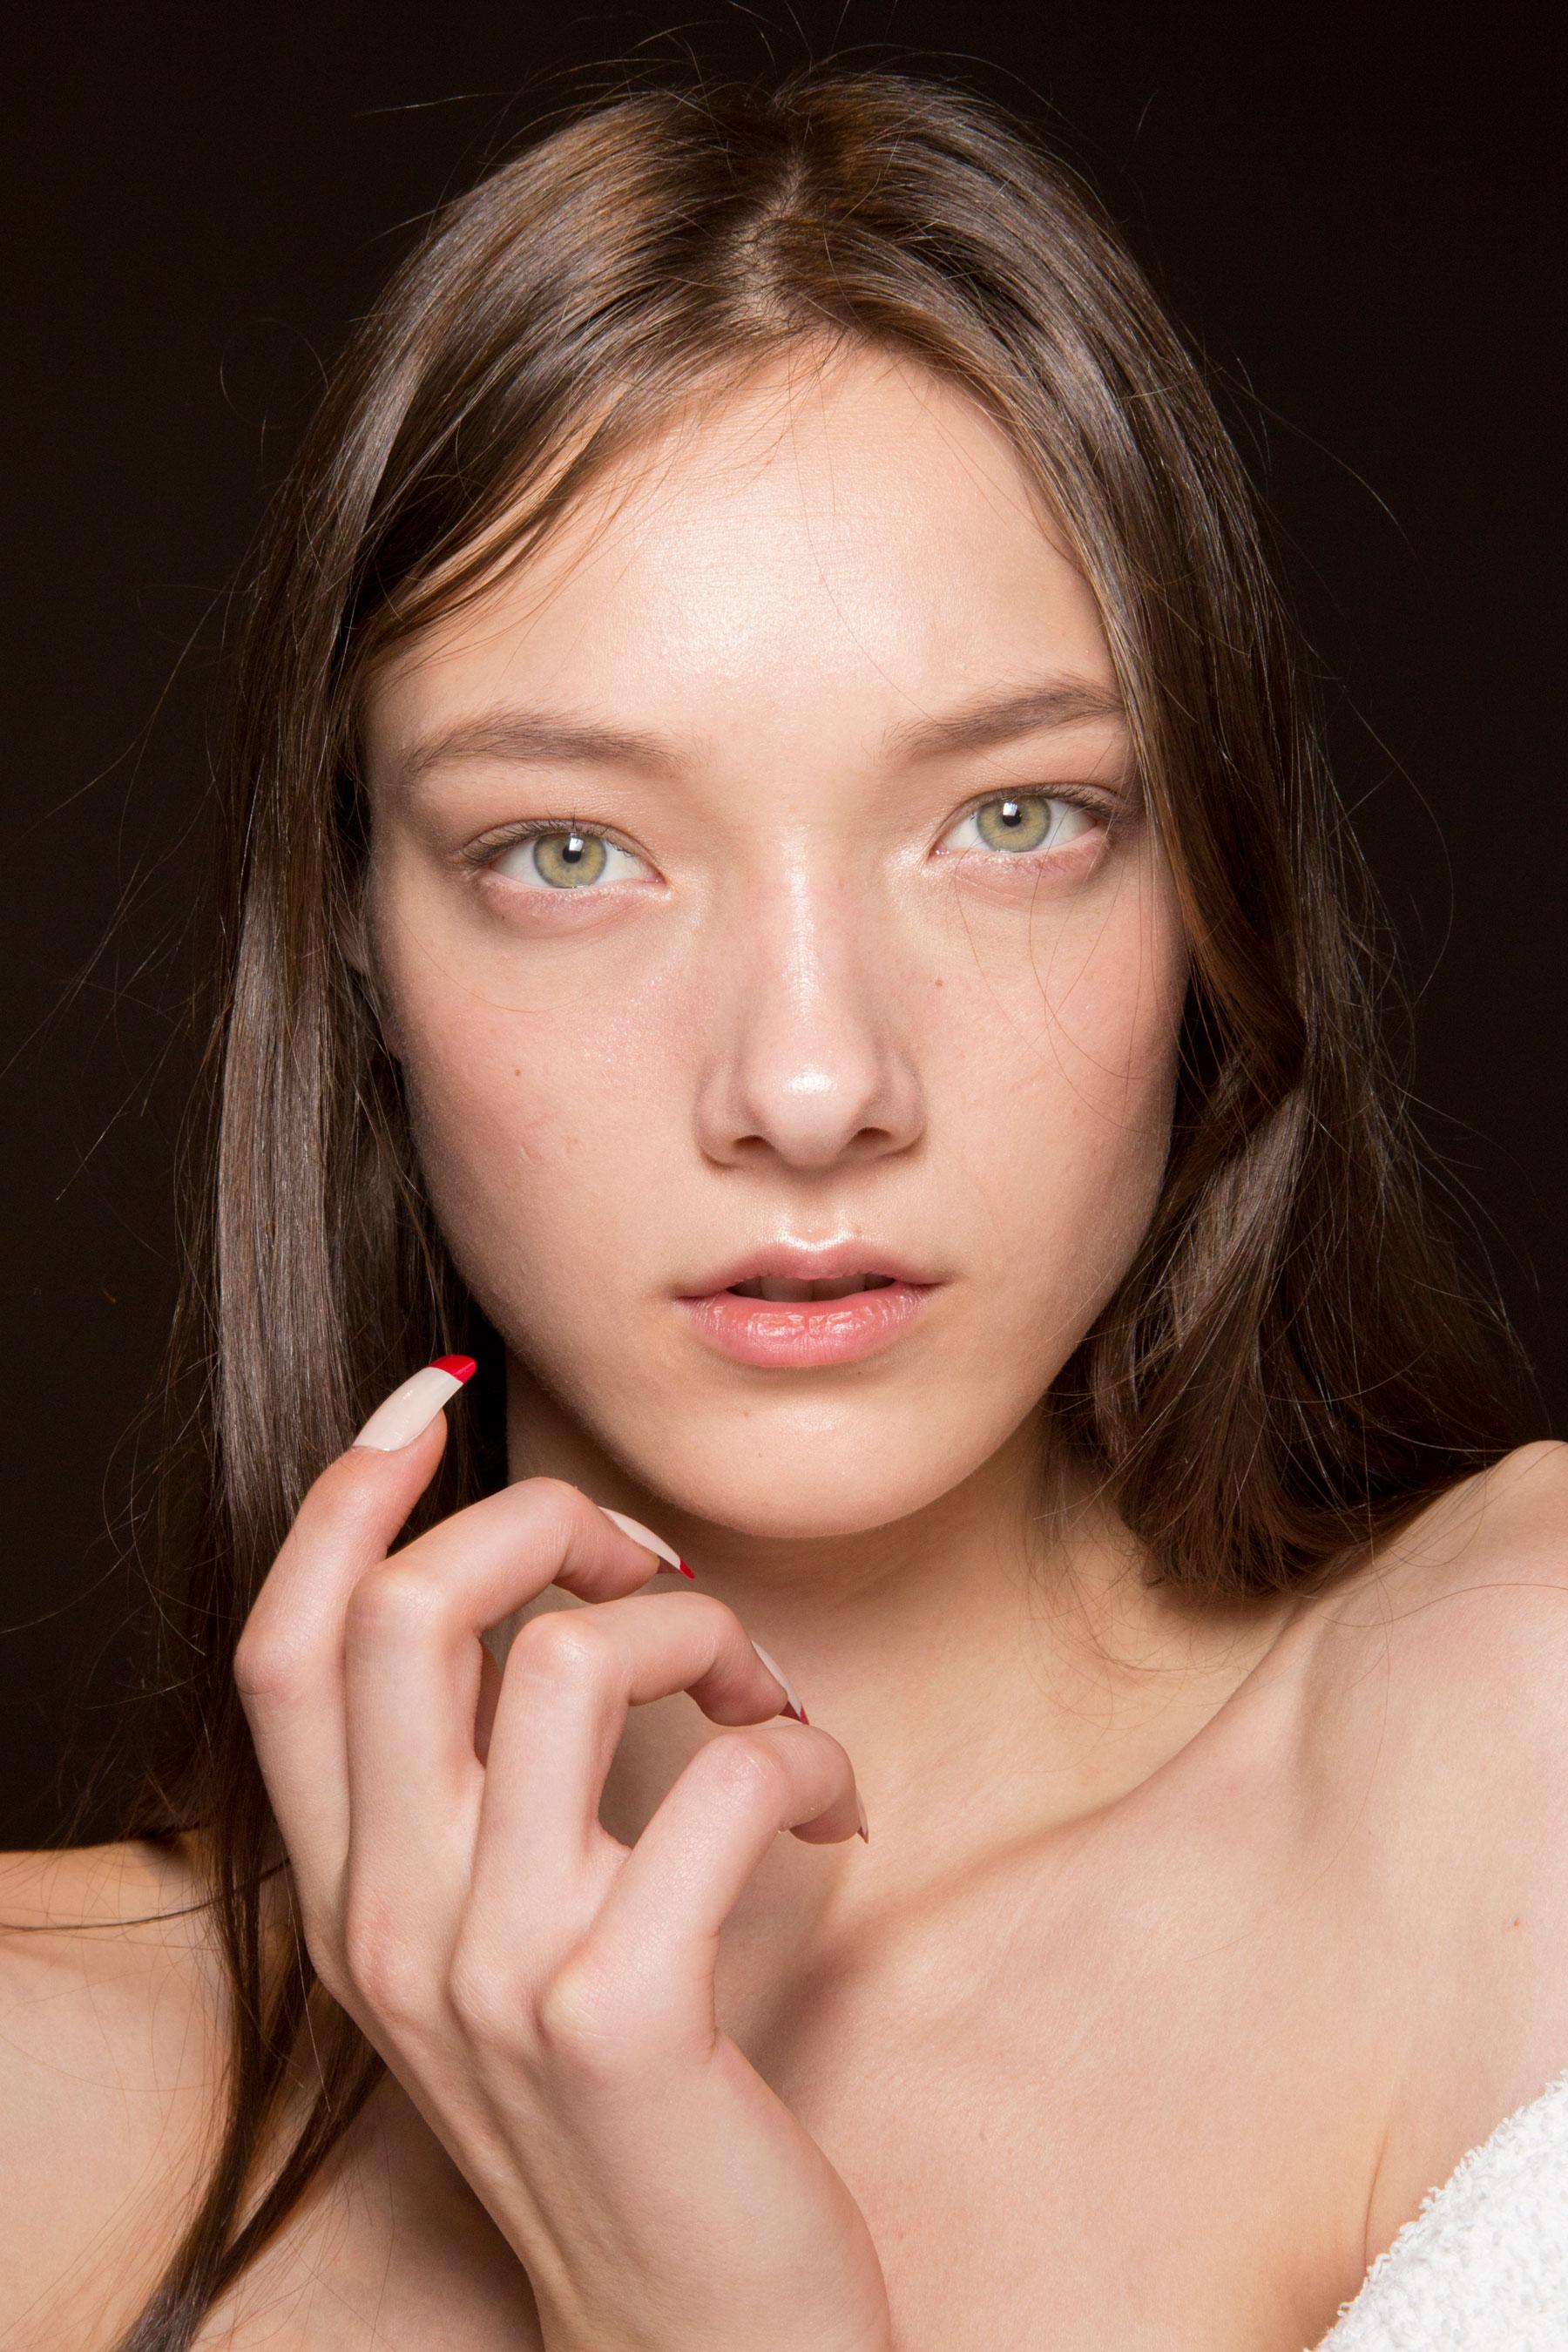 Gucci0-backsatge-beauty-spring-2016-fashion-show-the-impression-037